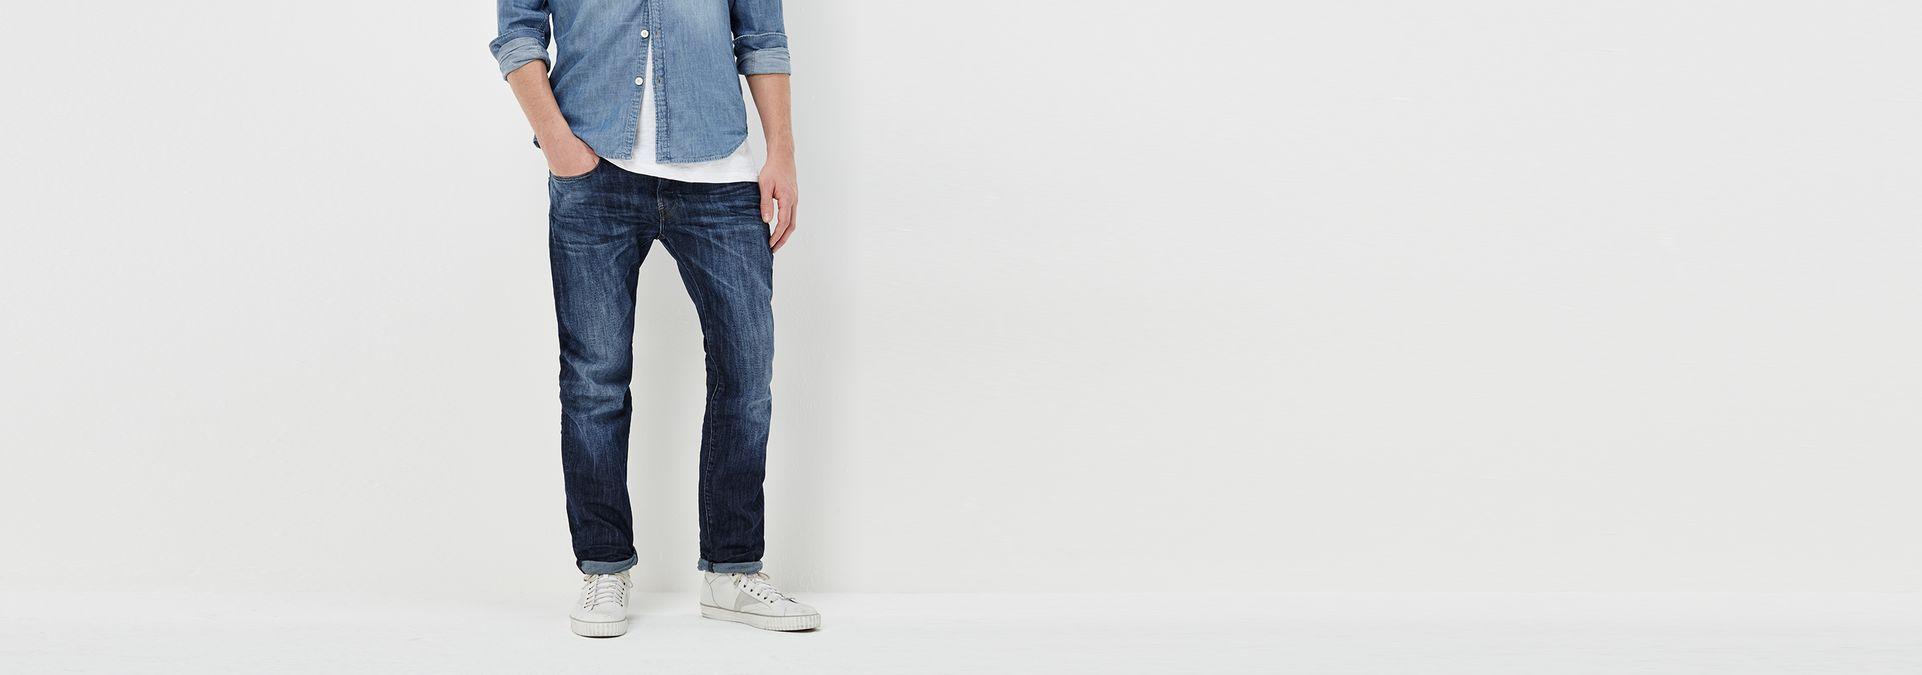 attacc straight jeans dk aged men sale g star raw. Black Bedroom Furniture Sets. Home Design Ideas